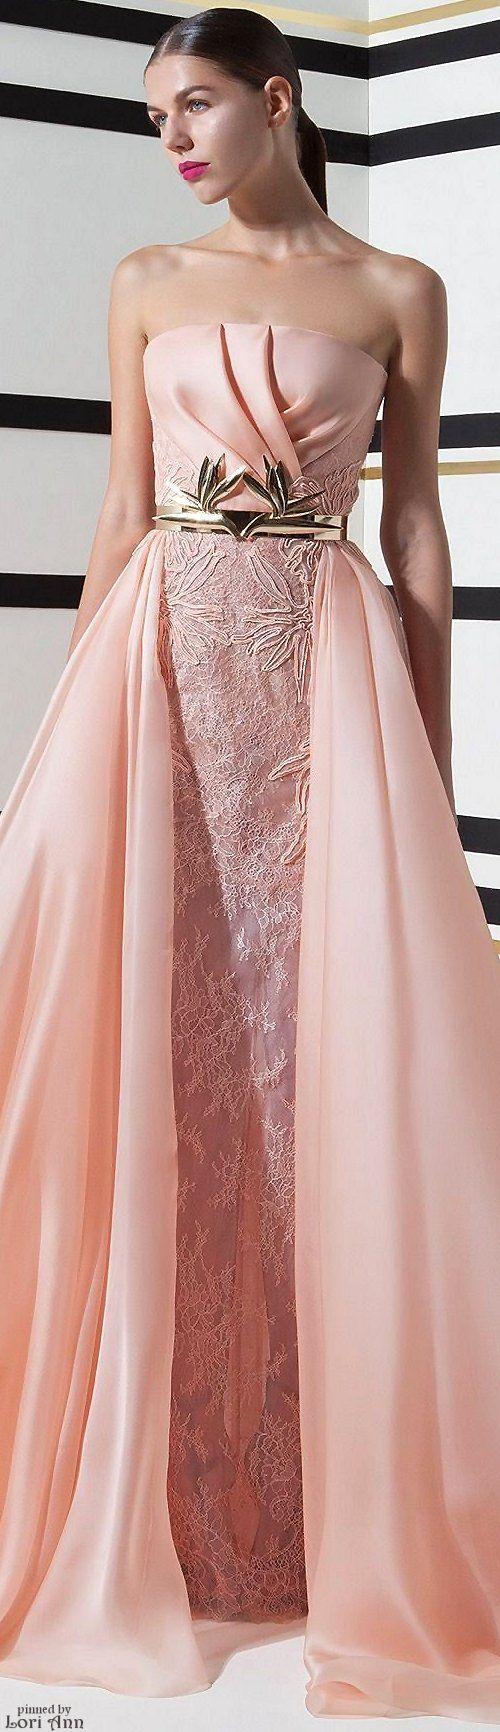 Платья для торжеств flipping gowns and dream closets